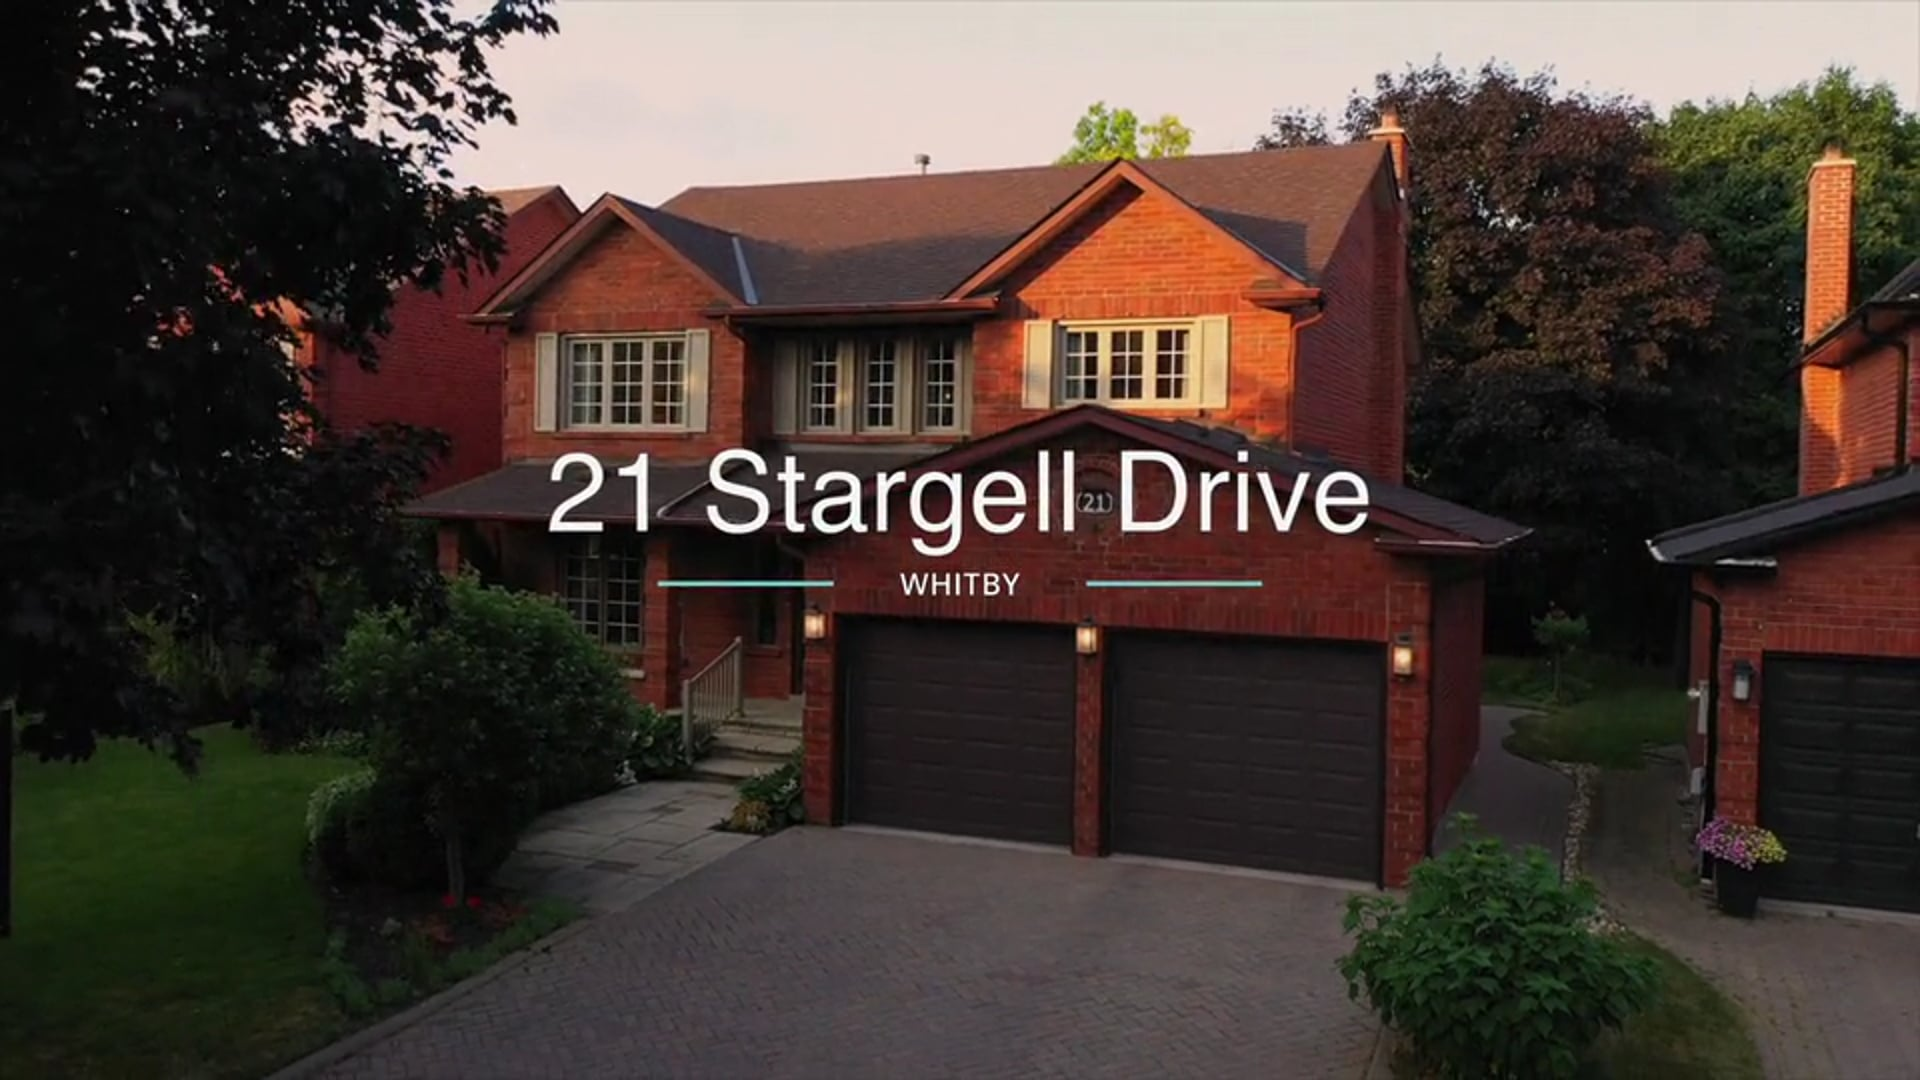 21 Stargell Dr